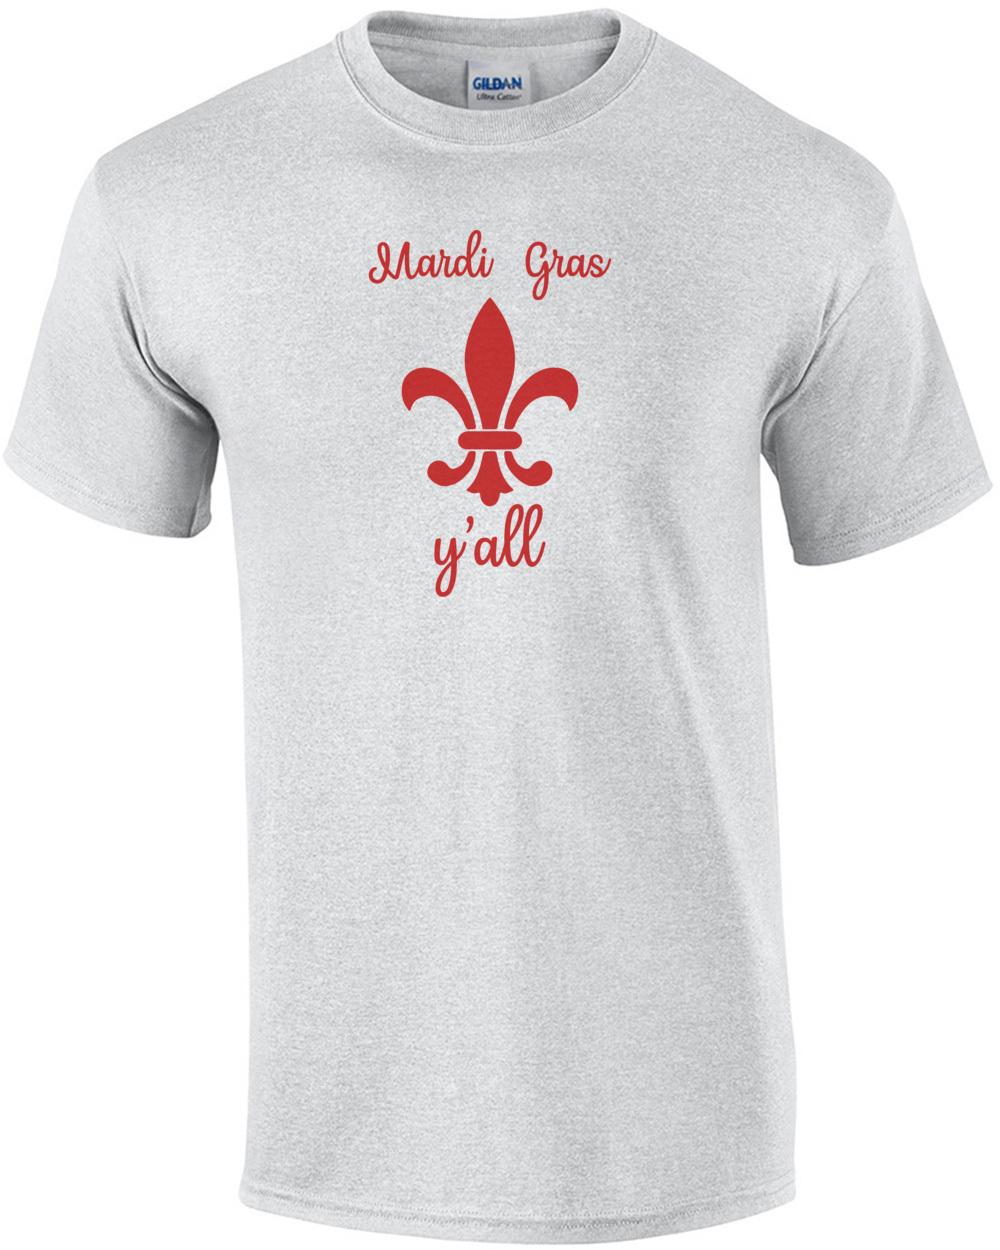 a93c7569 mardi-gras-yall--show-me-your-beads--louisiana-tshirt-mens-regular-ash.jpg